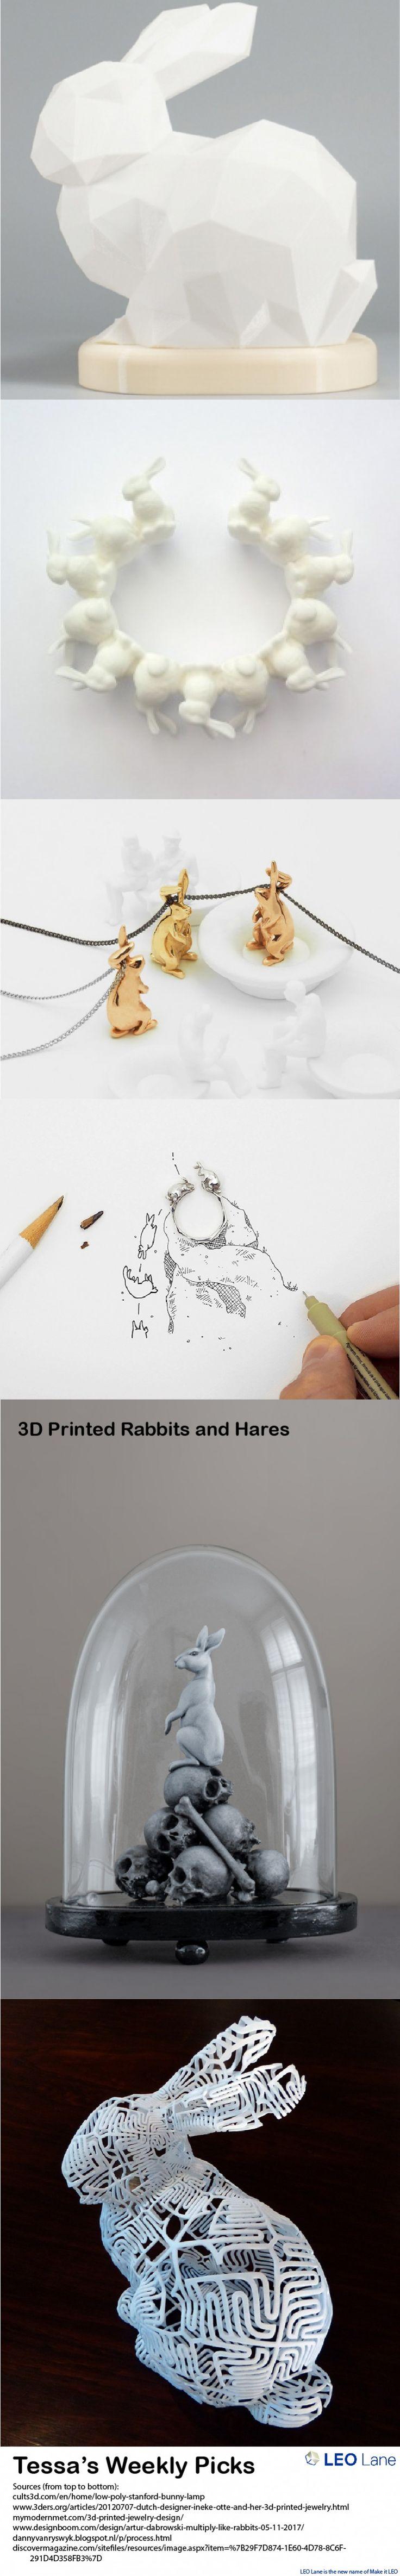 Charming Tessau0027s Weekly Picks U2013 3D Printed Rabbits And Hares